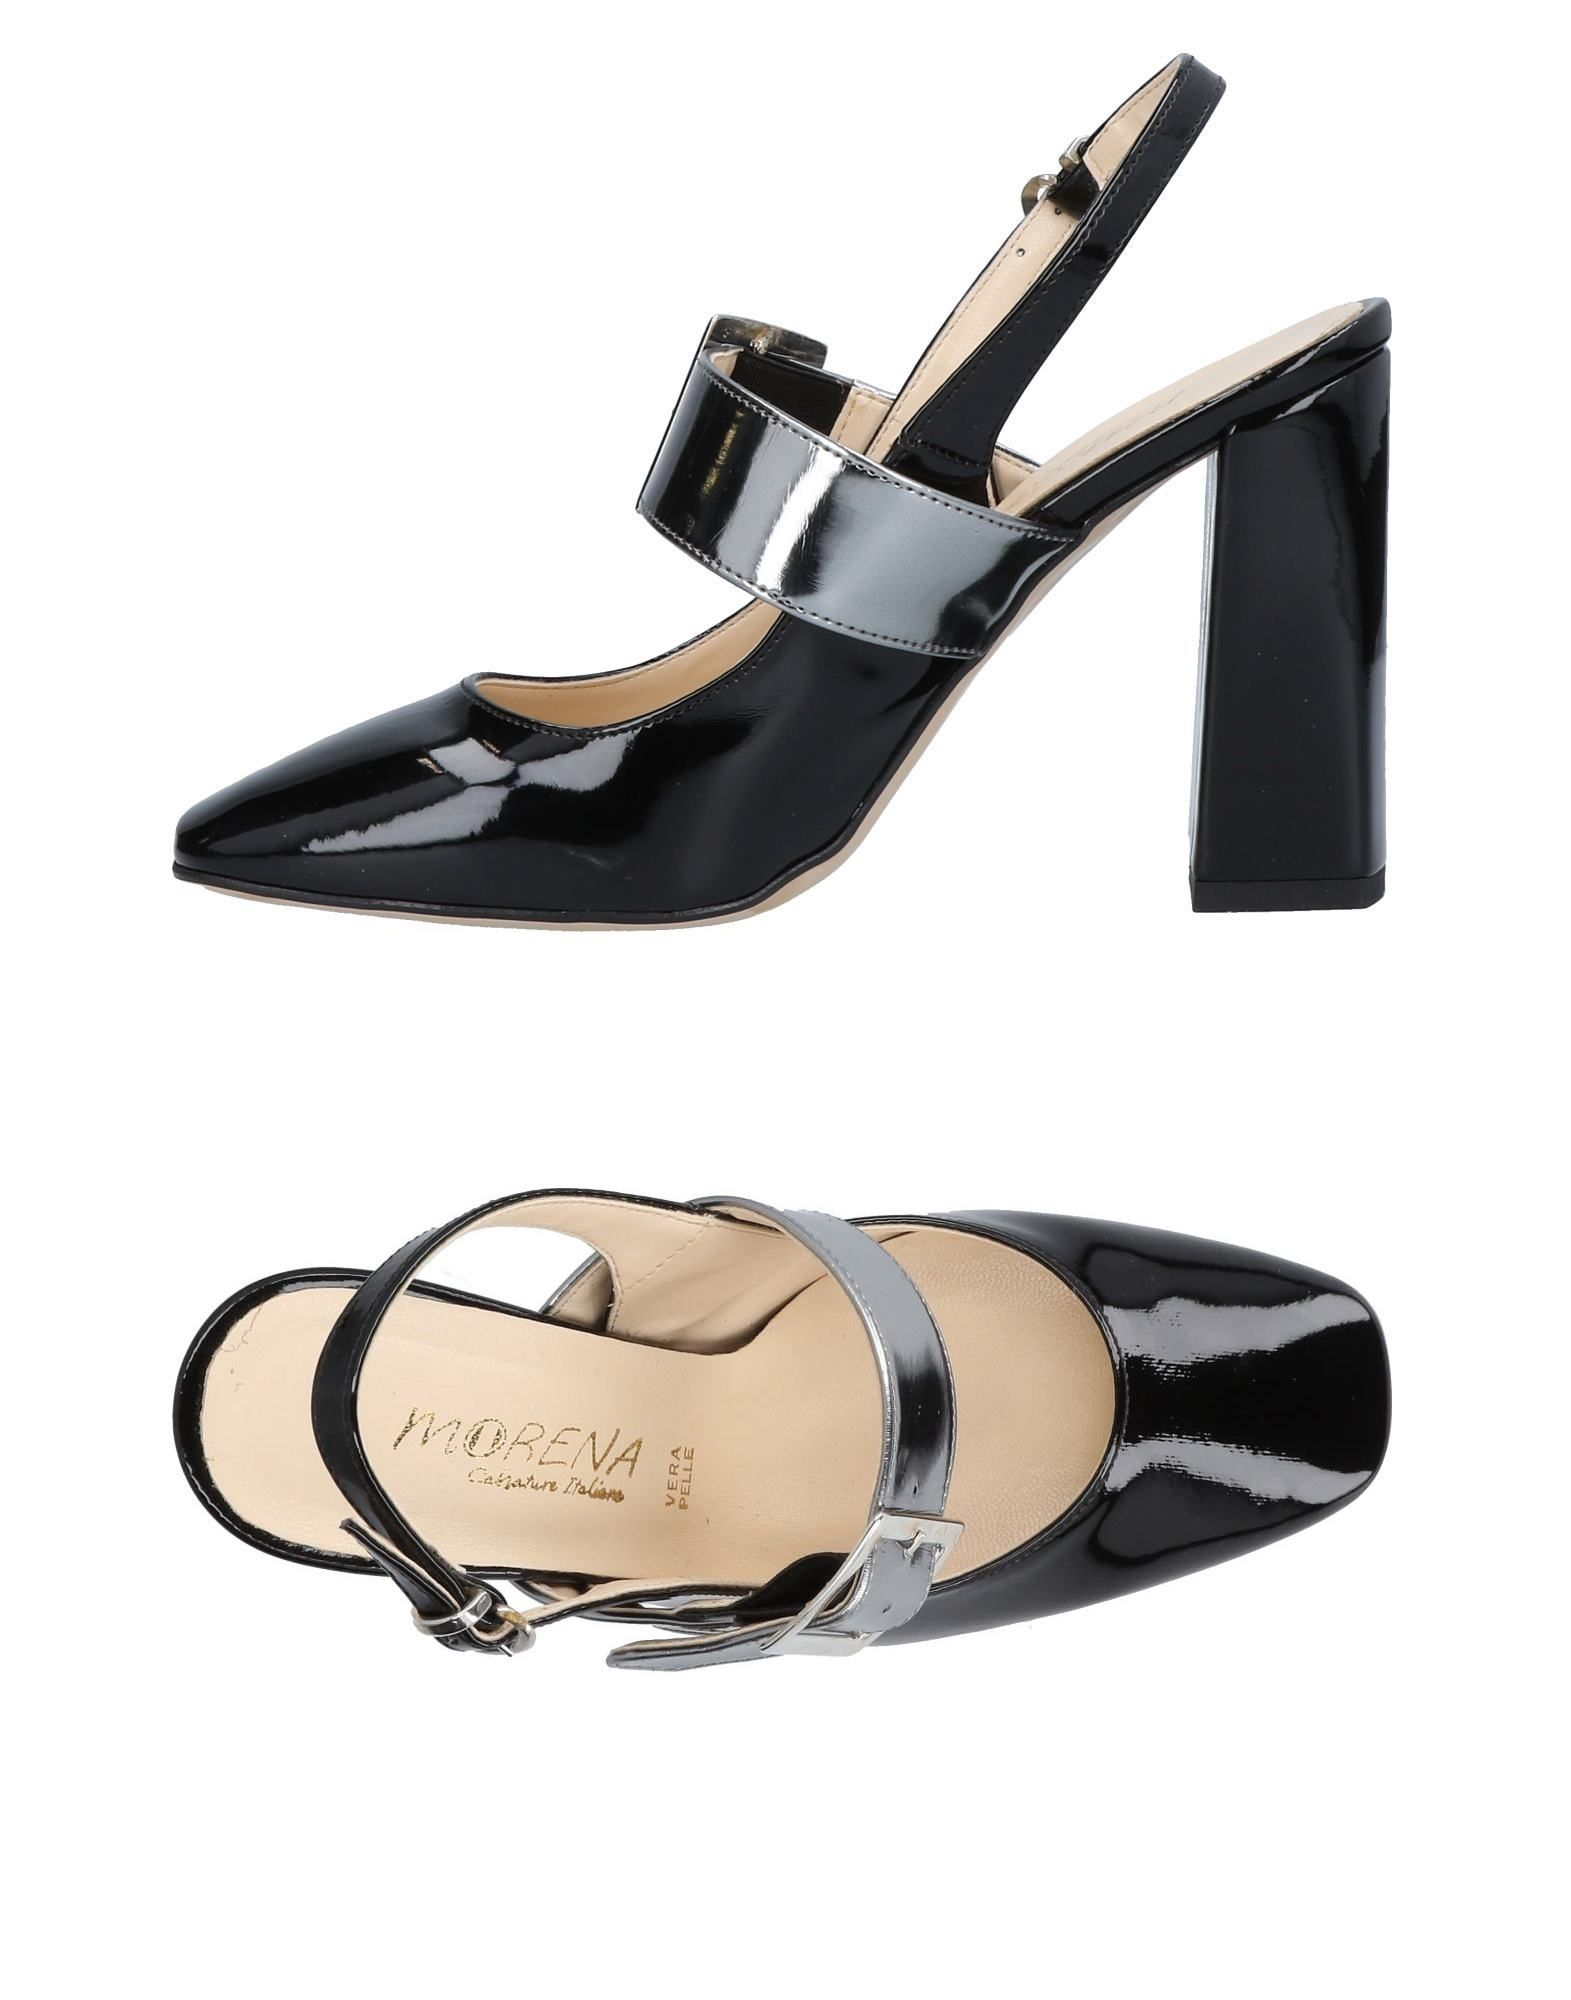 Morena Calzature Italiane Pumps Damen  11462925MC Gute Qualität beliebte Schuhe